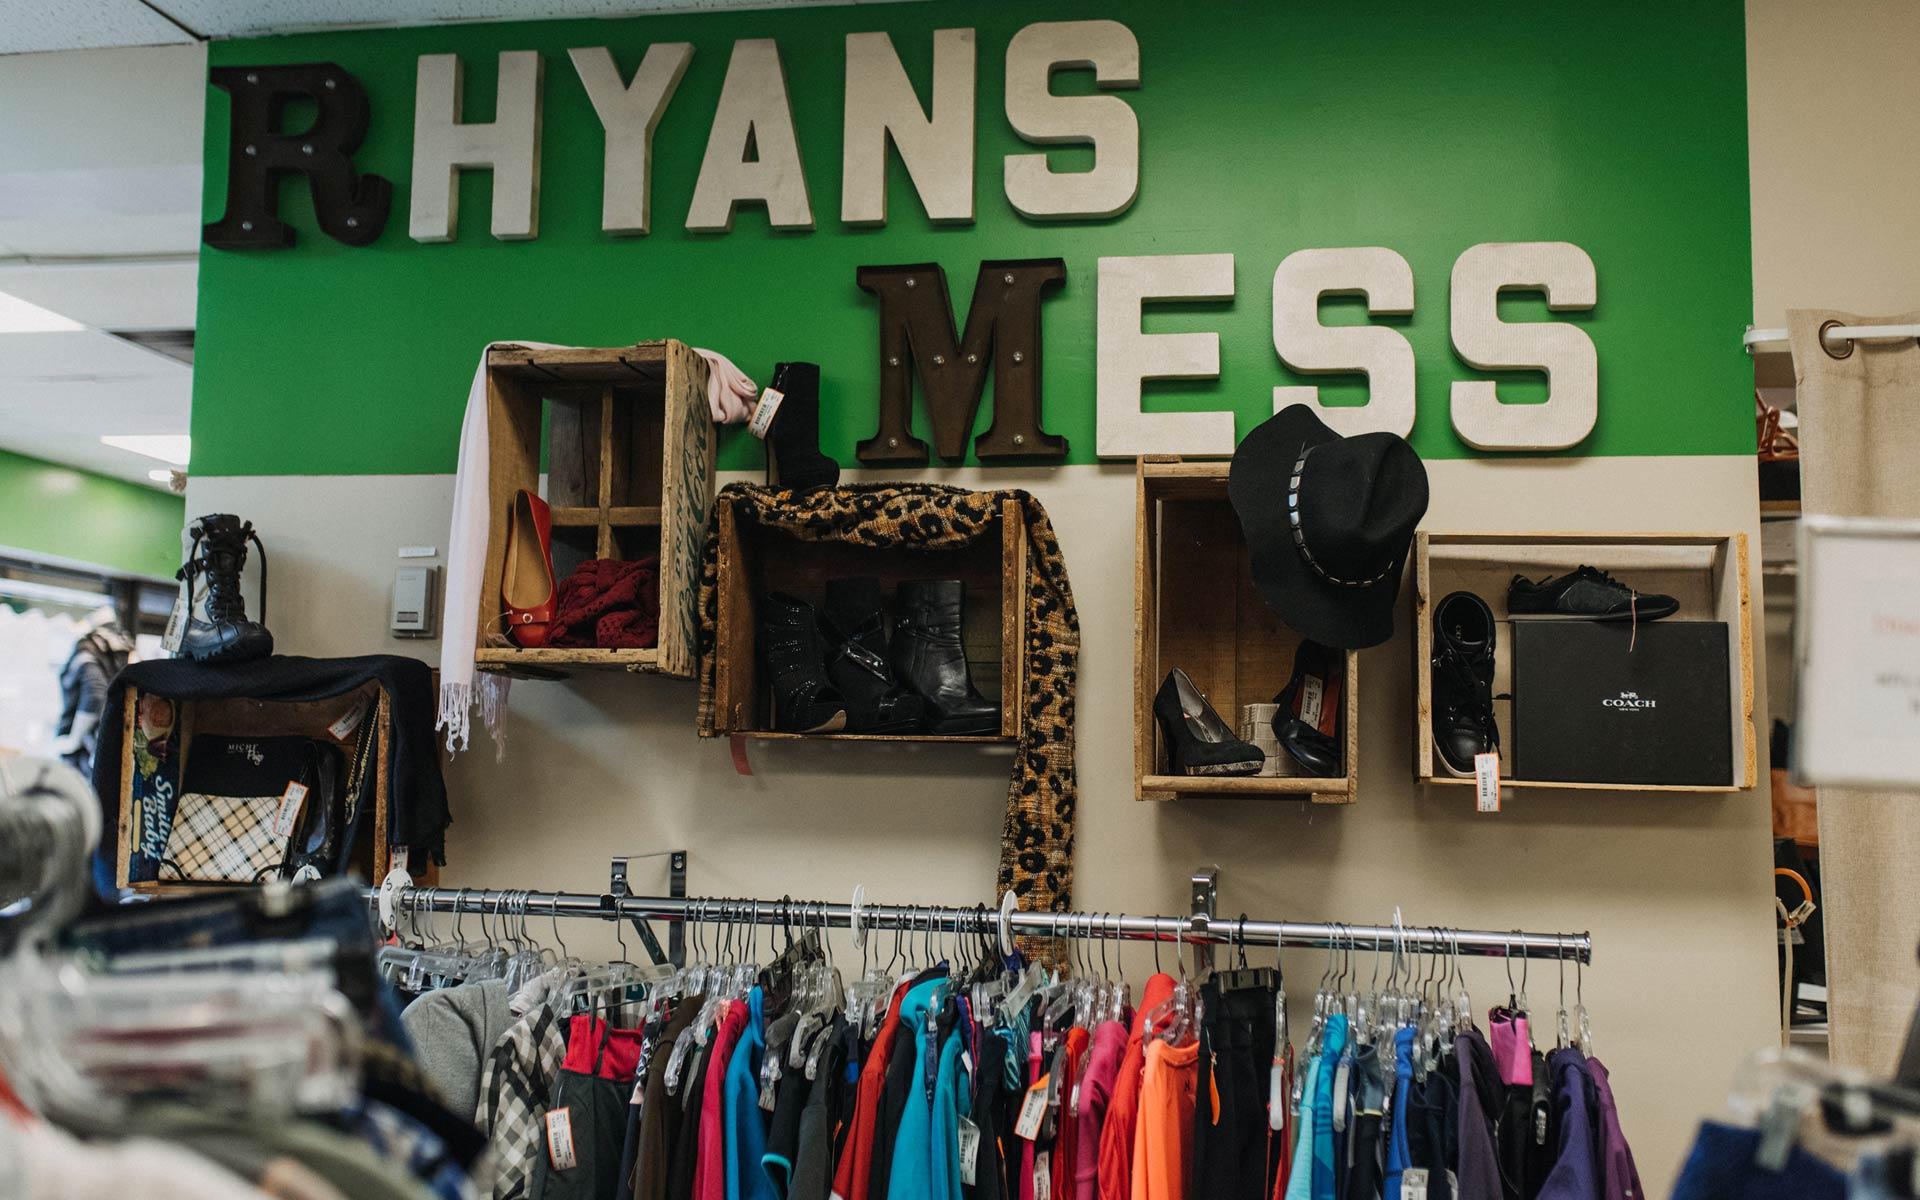 Rhyan's Mess Signage